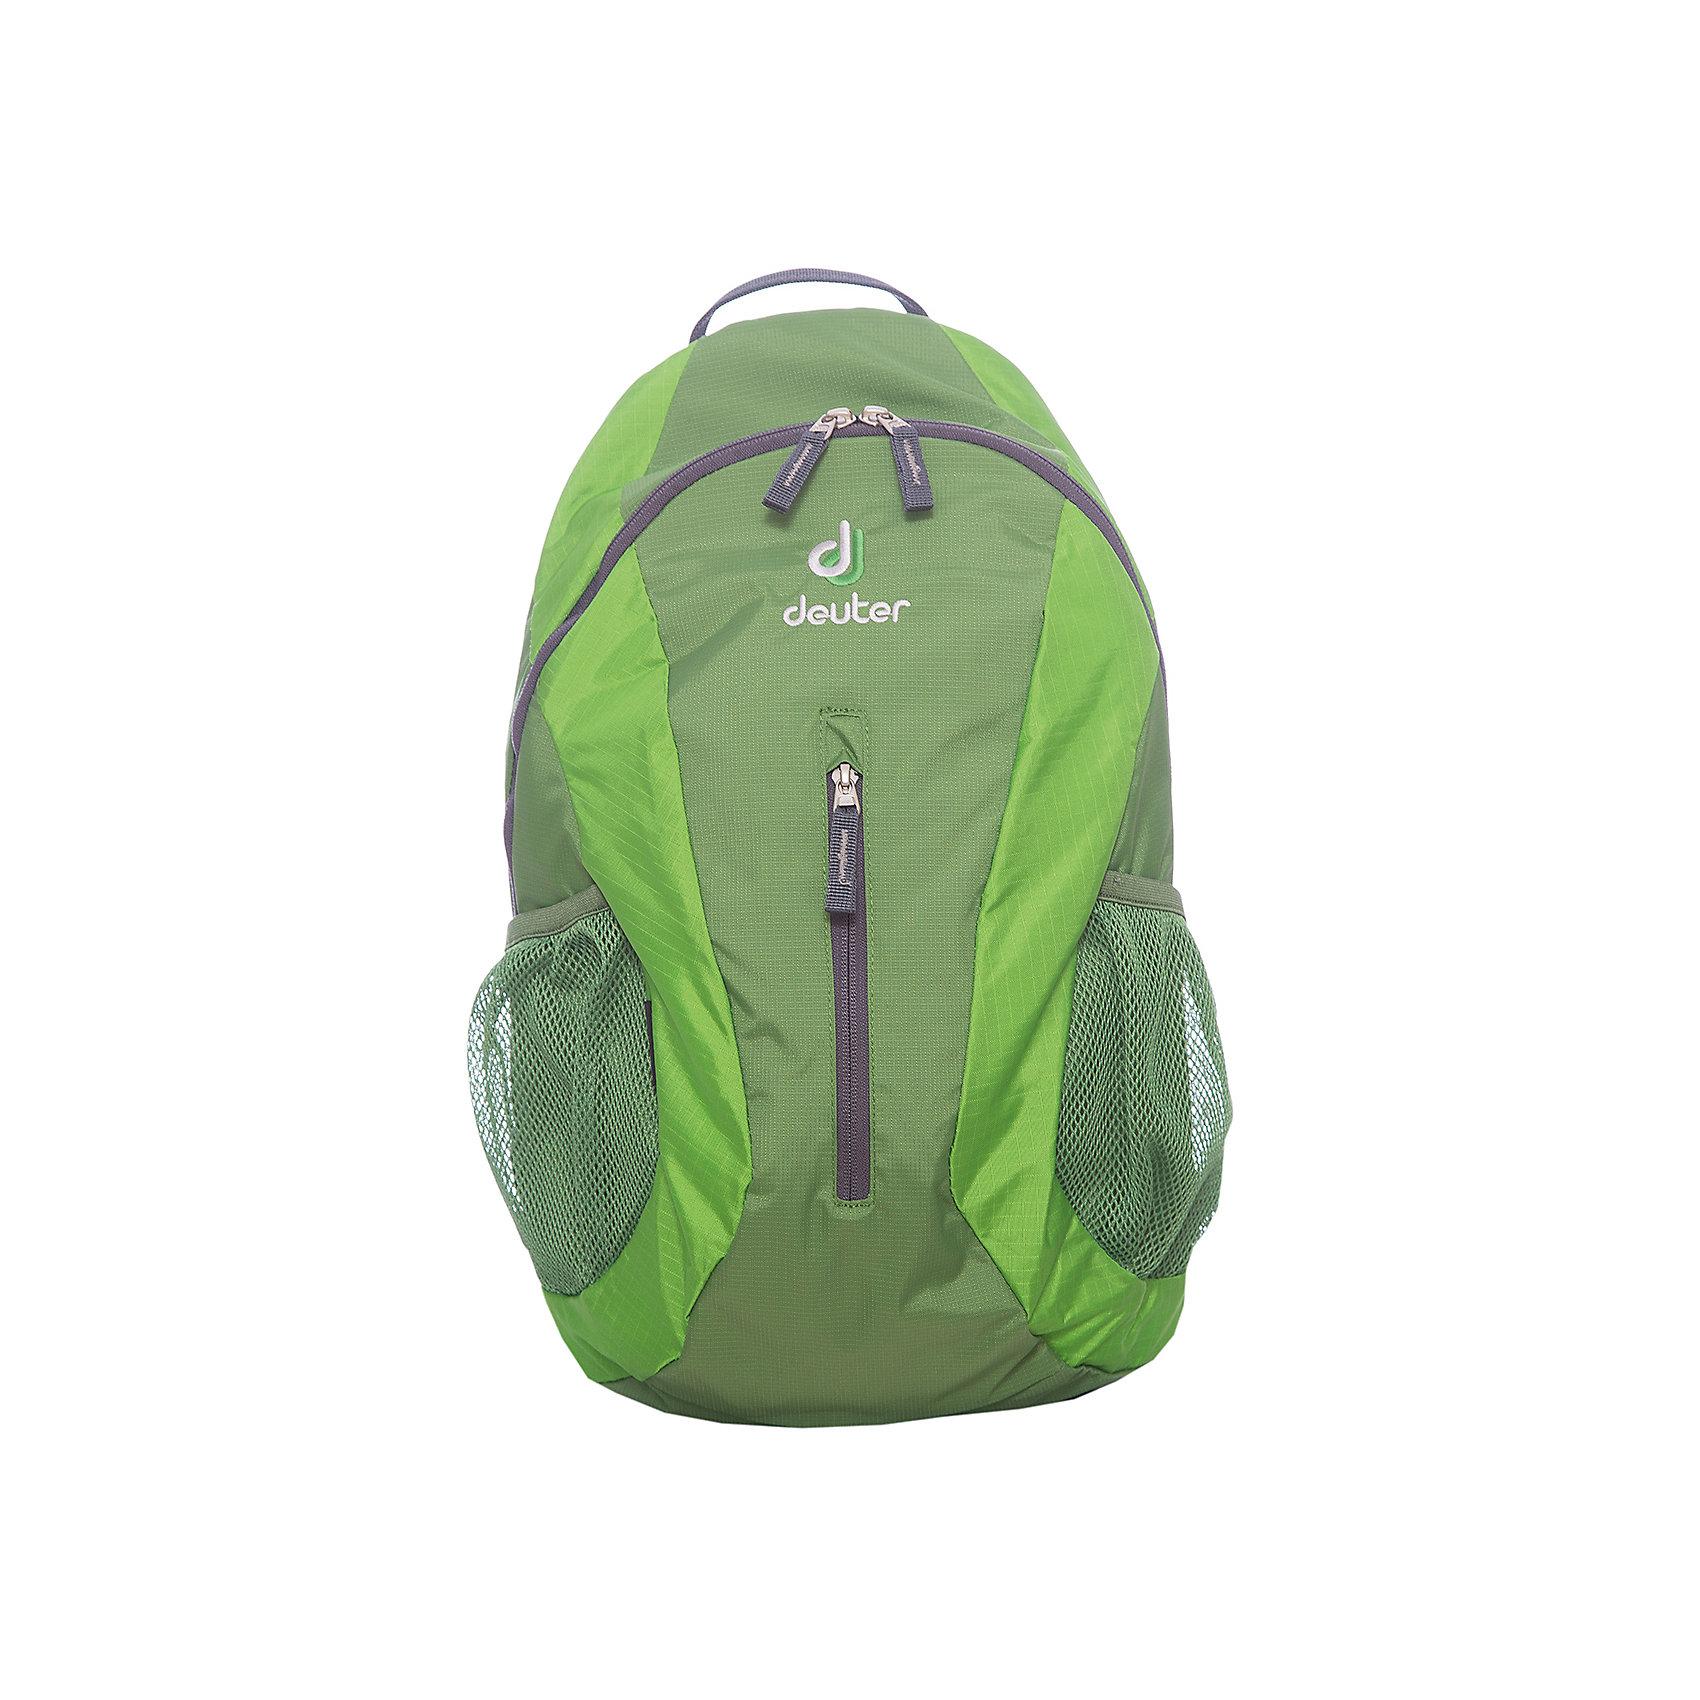 Deuter Рюкзак City light, зеленый рюкзак deuter gigant 32l 2017 bay dresscode